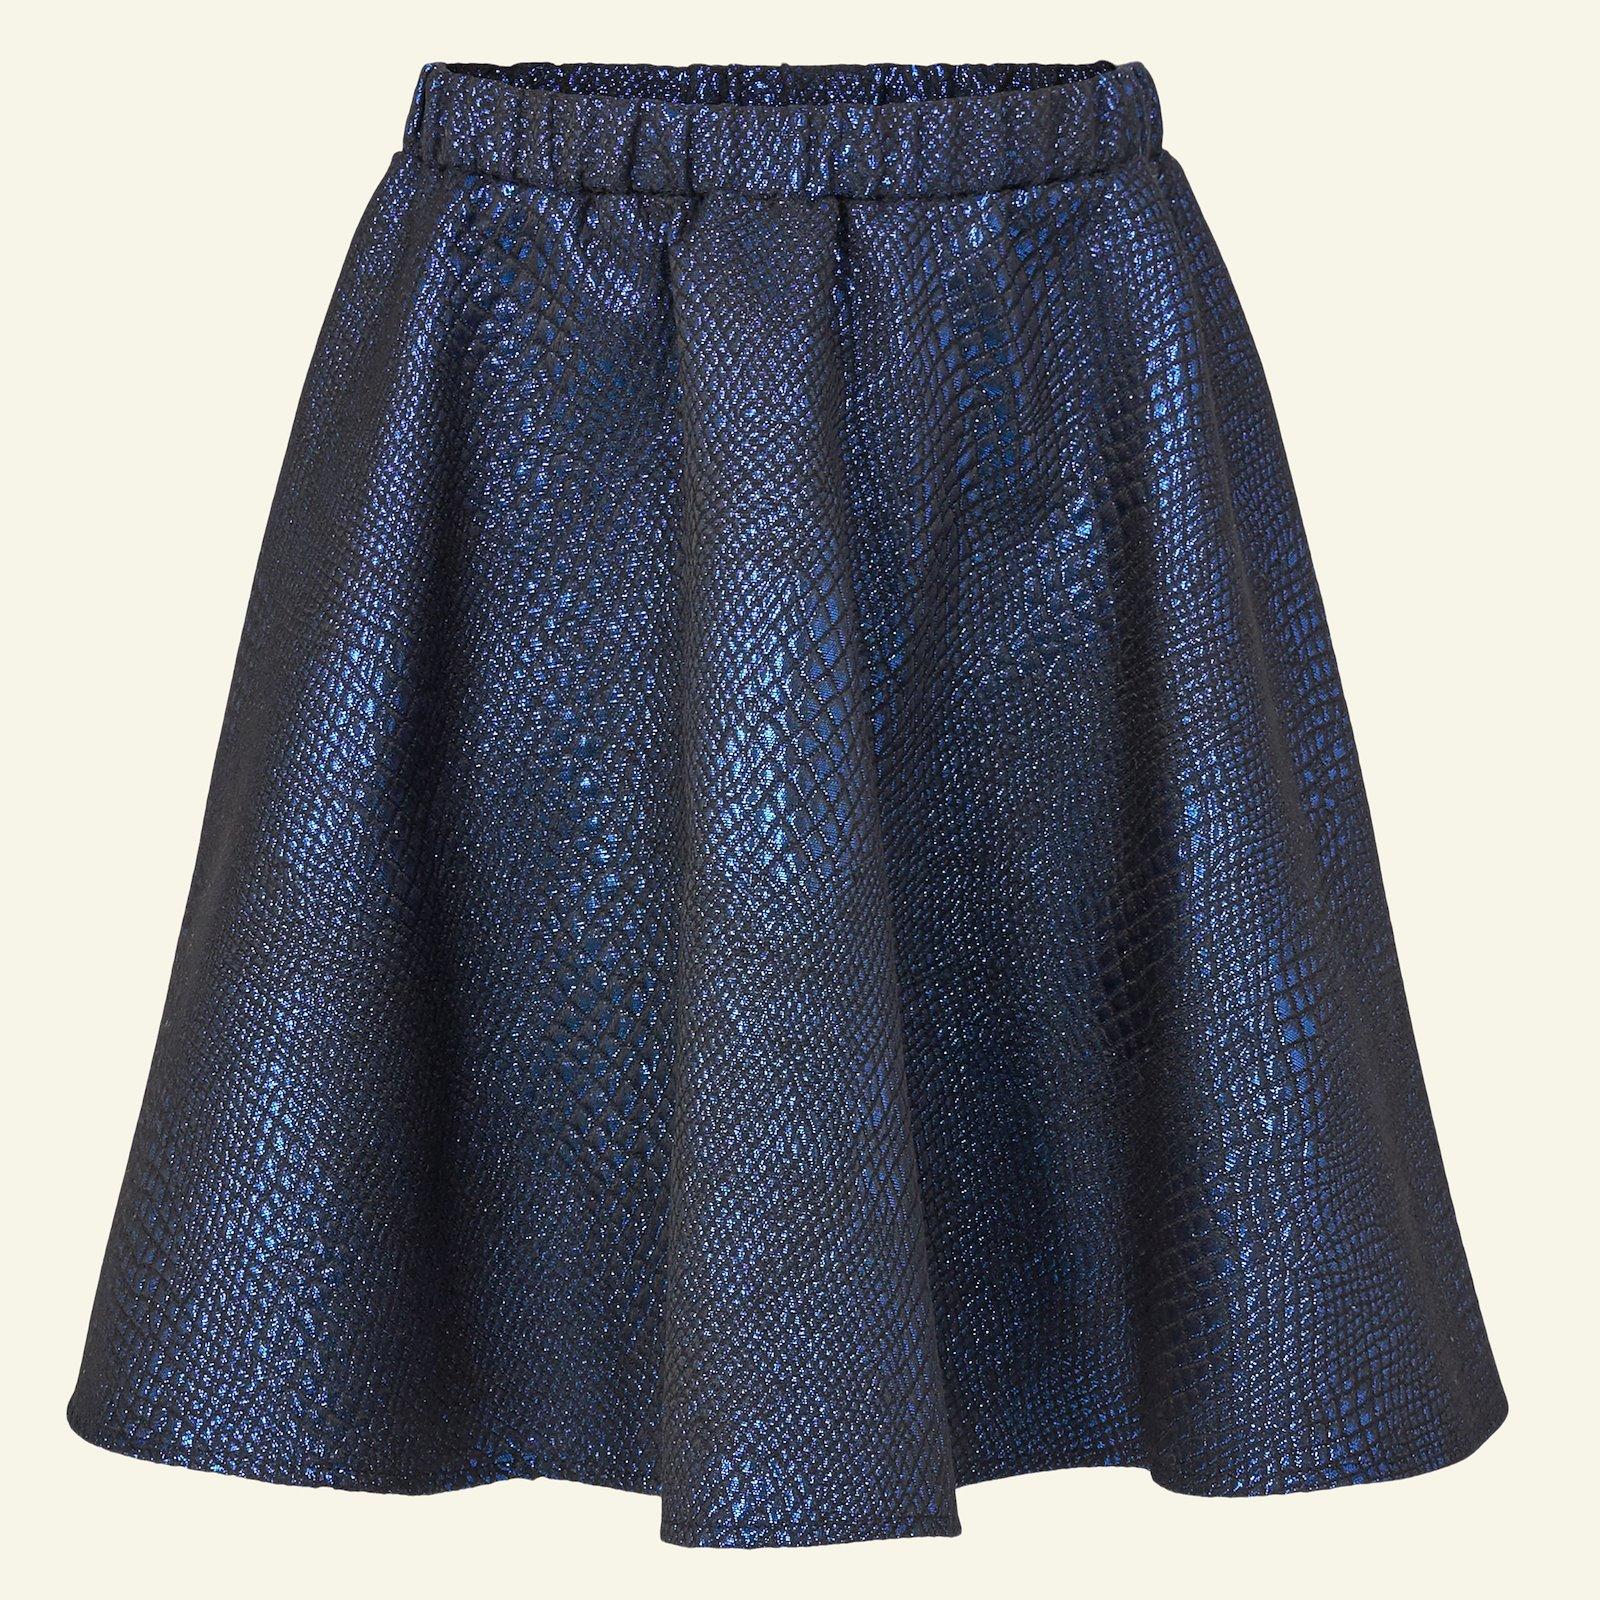 Woven jacquard with blue lurex p61019_400307_sskit